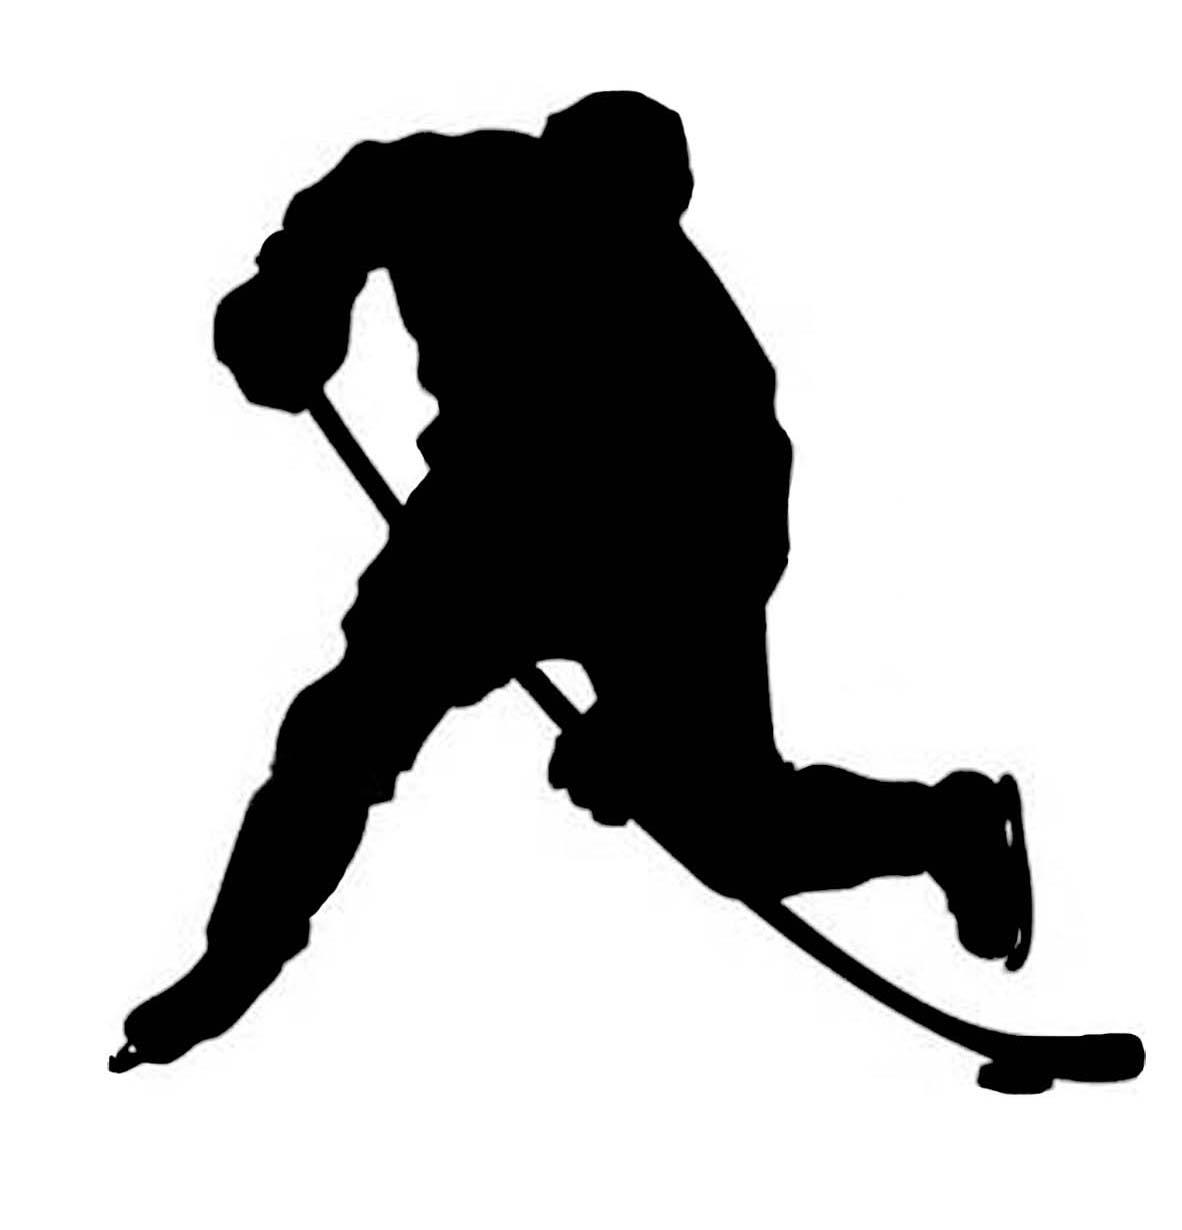 Hockey player shooting clipart